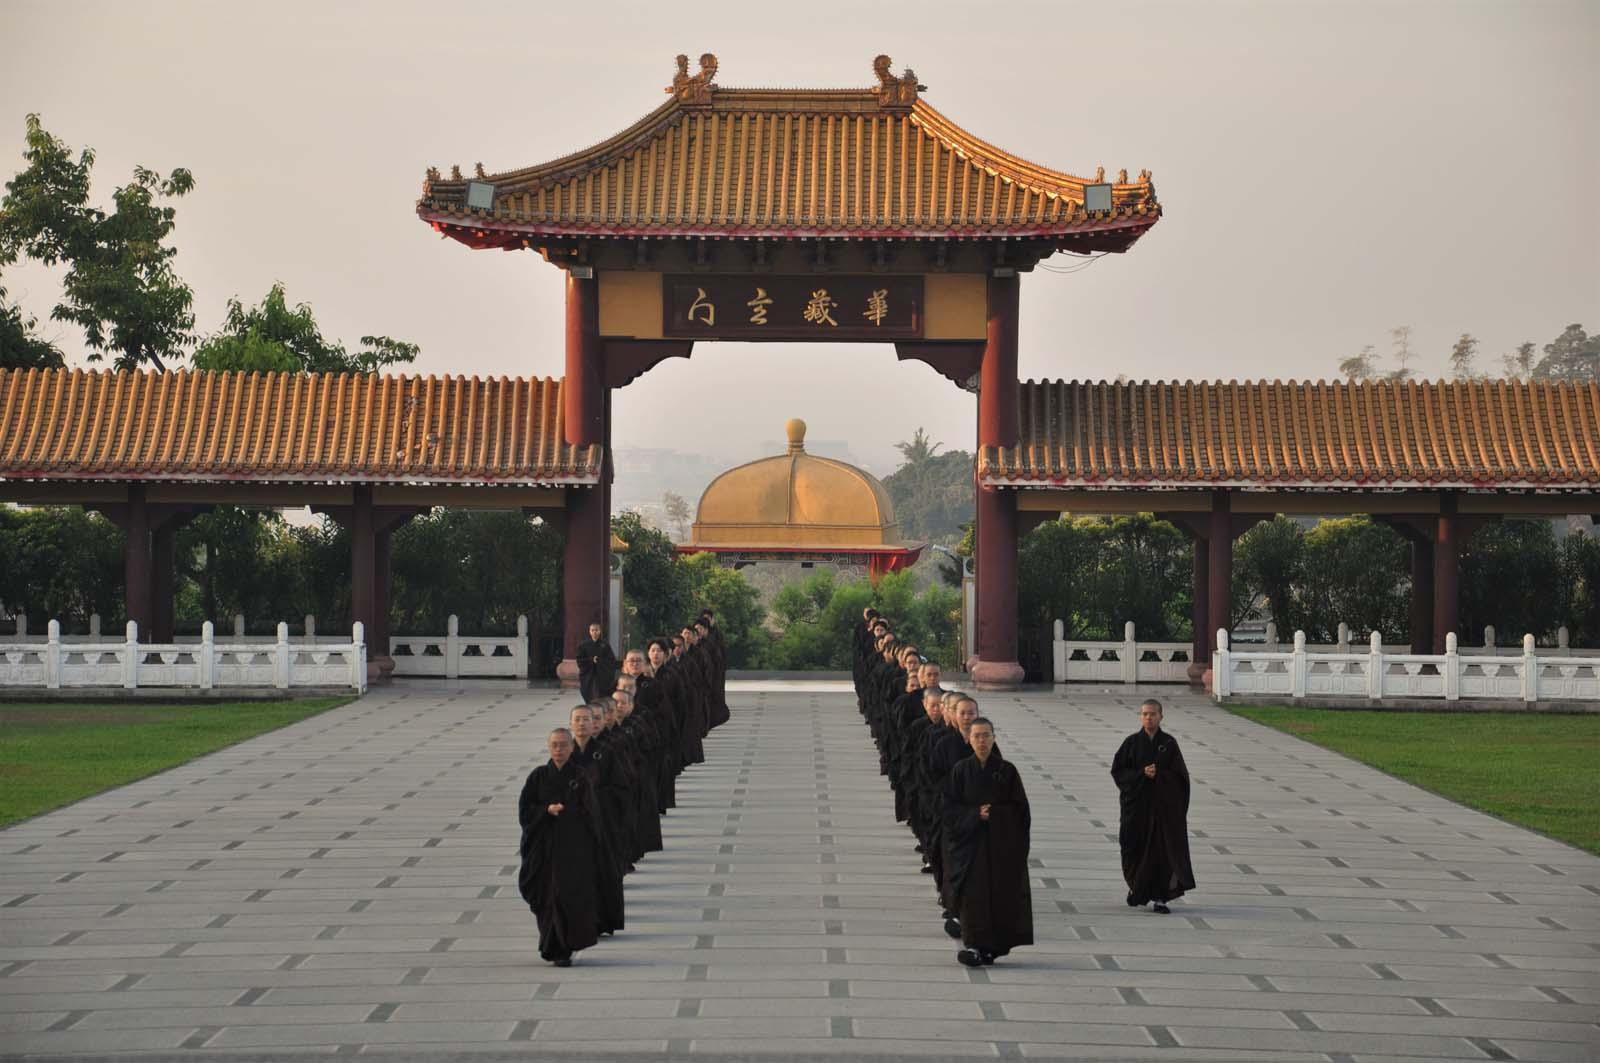 kloster ferien taiwan 10 globesession. Black Bedroom Furniture Sets. Home Design Ideas